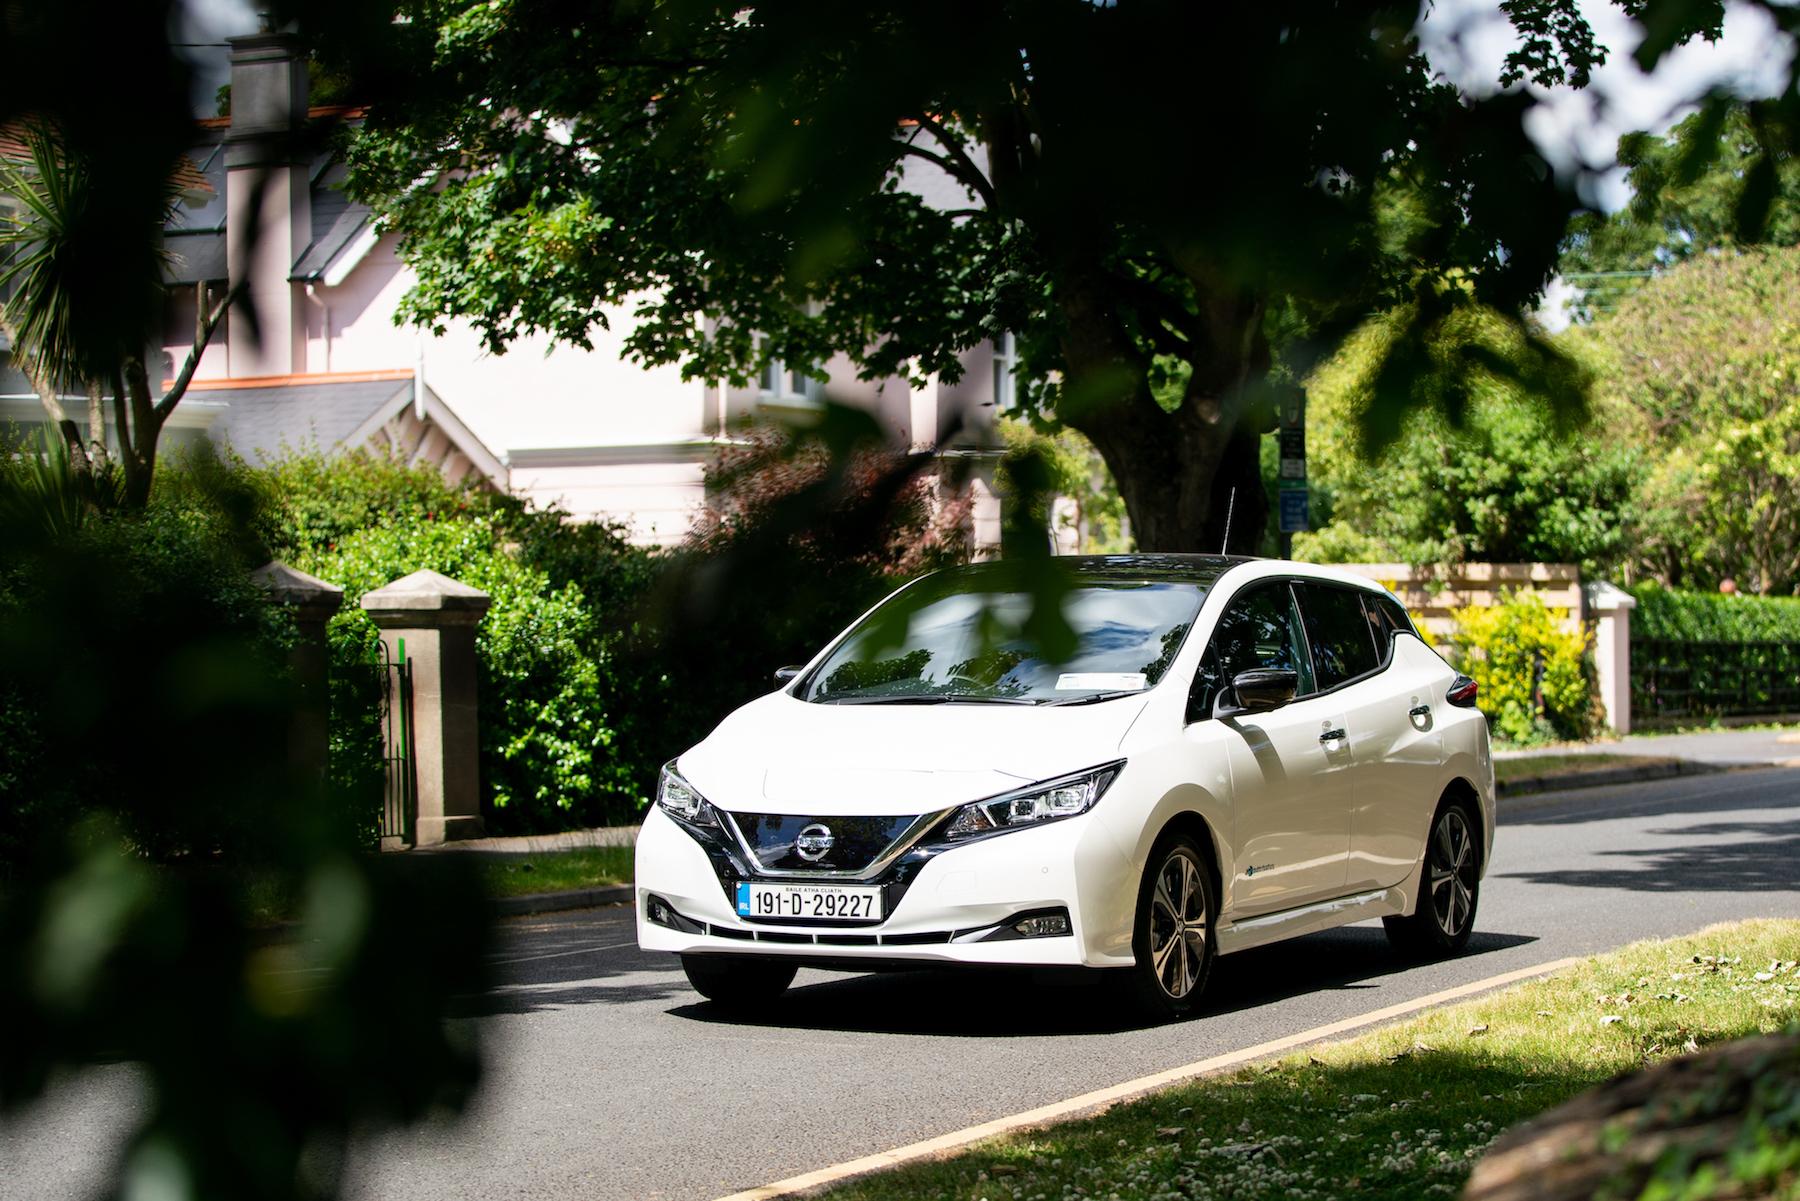 Nissan Leaf tops Irish EV sales for first half of 191 period